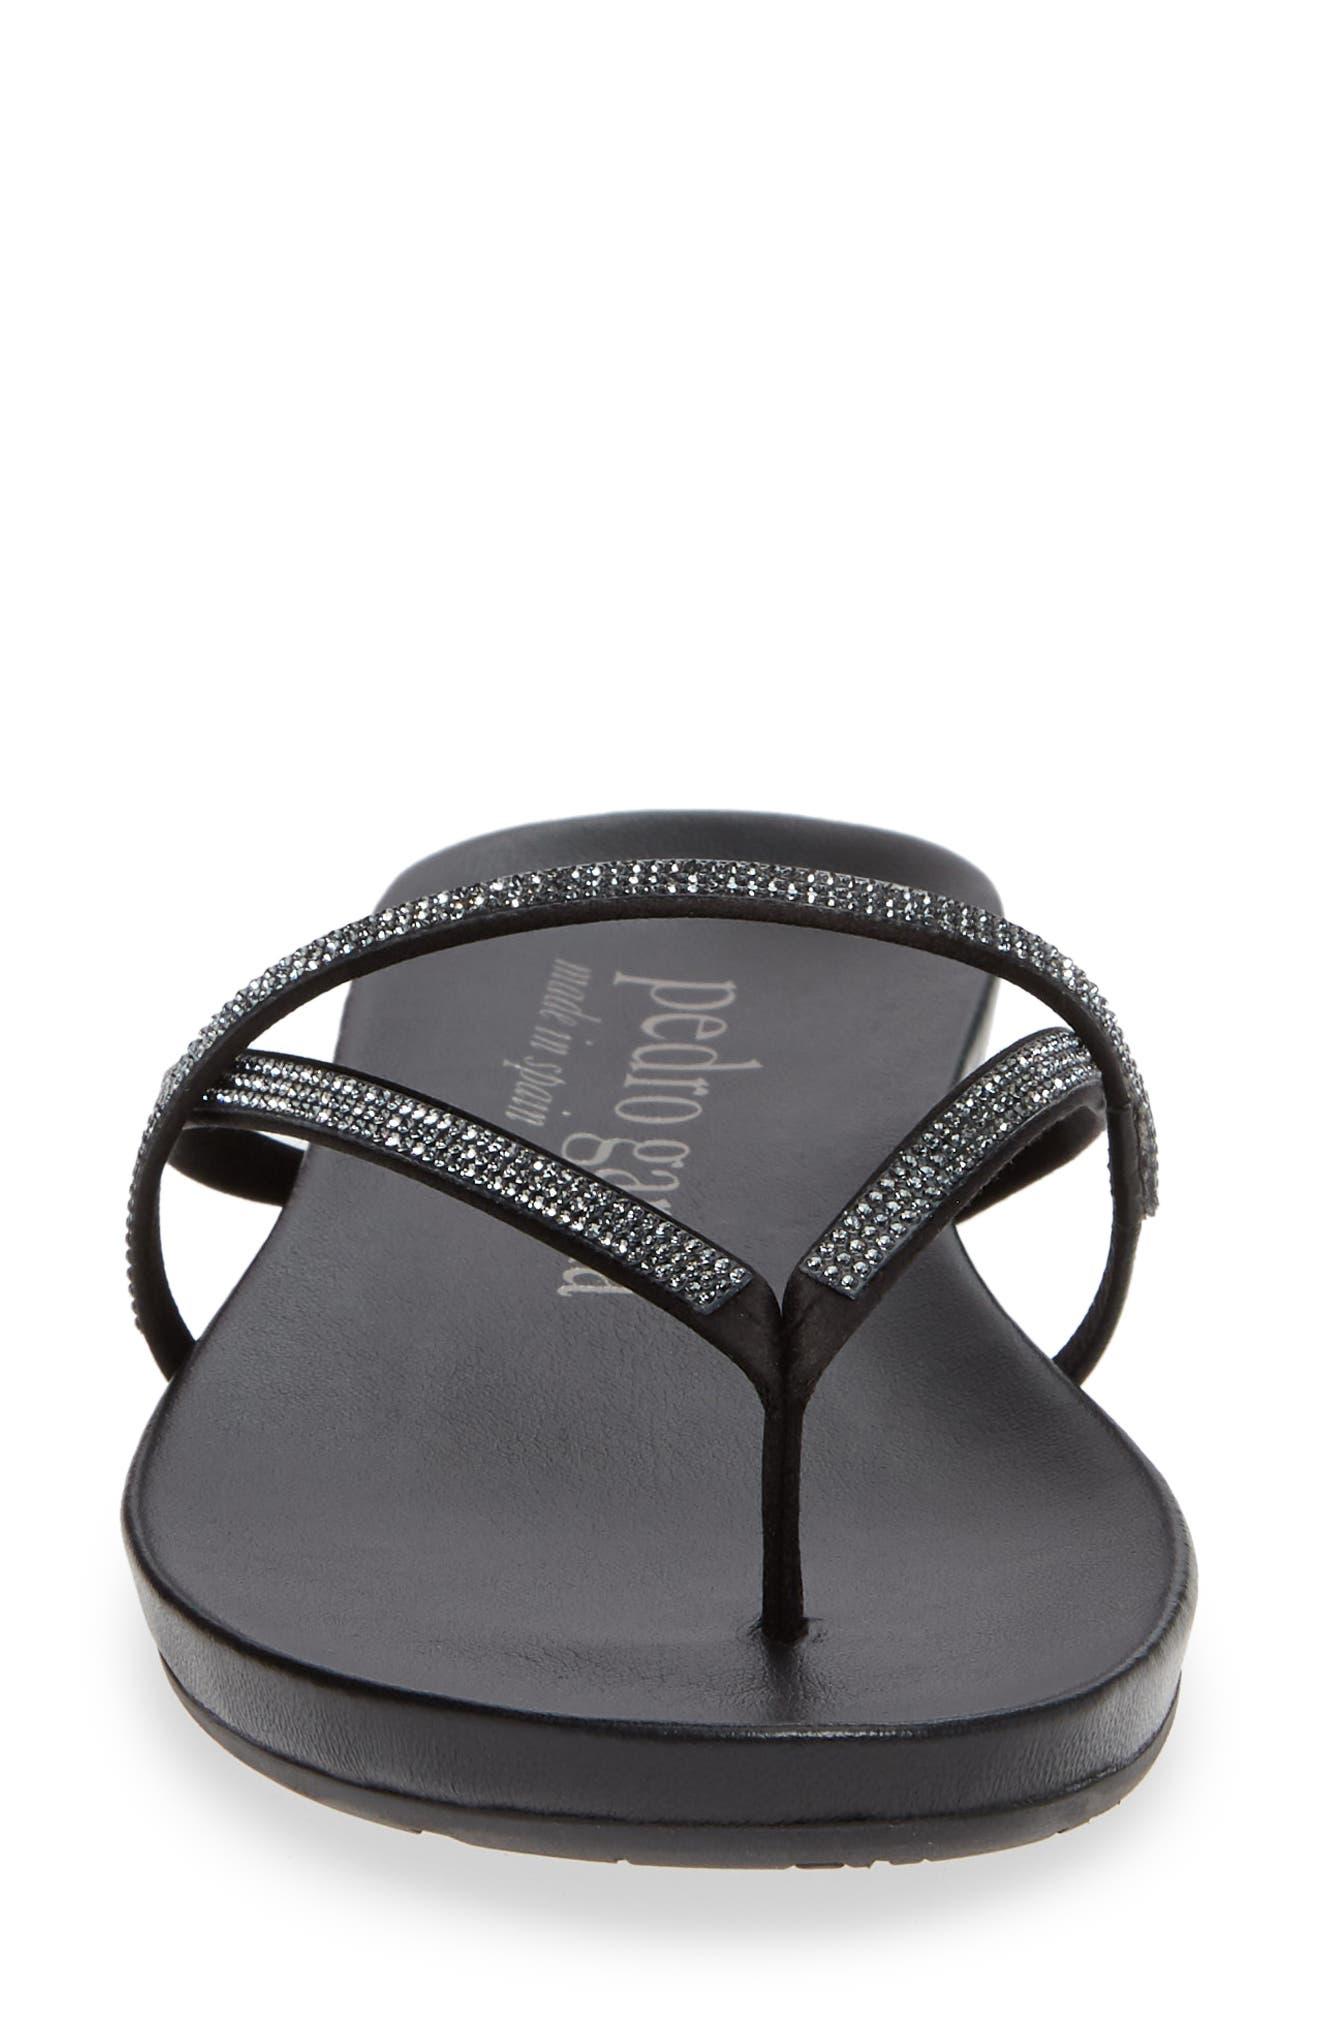 Giulia Crystal Embellished Sandal,                             Alternate thumbnail 4, color,                             METEORITE SATIN